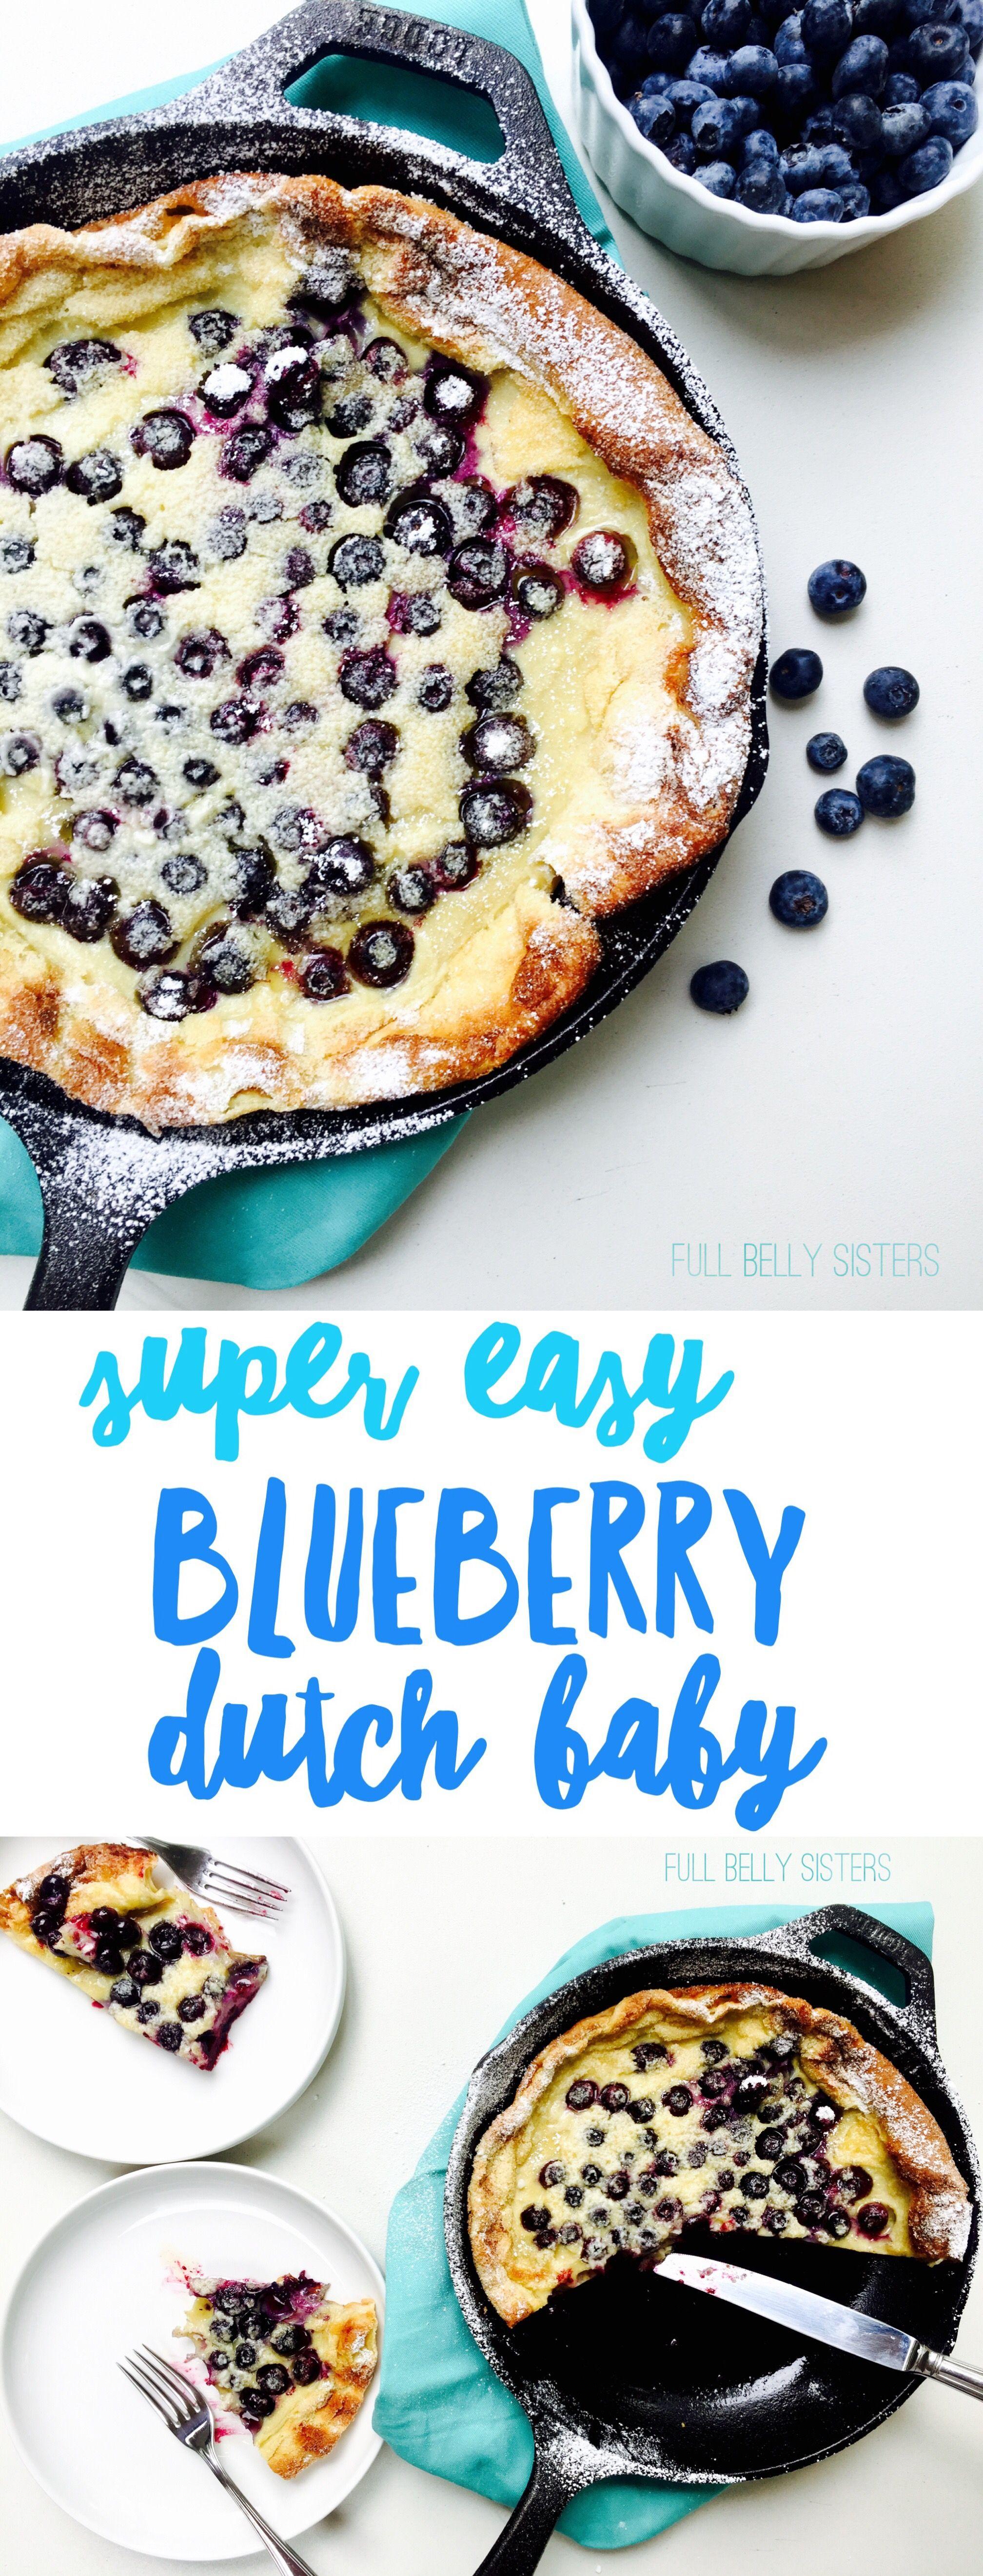 Blueberry Dutch Baby | Nutritious breakfast, Blueberry ...